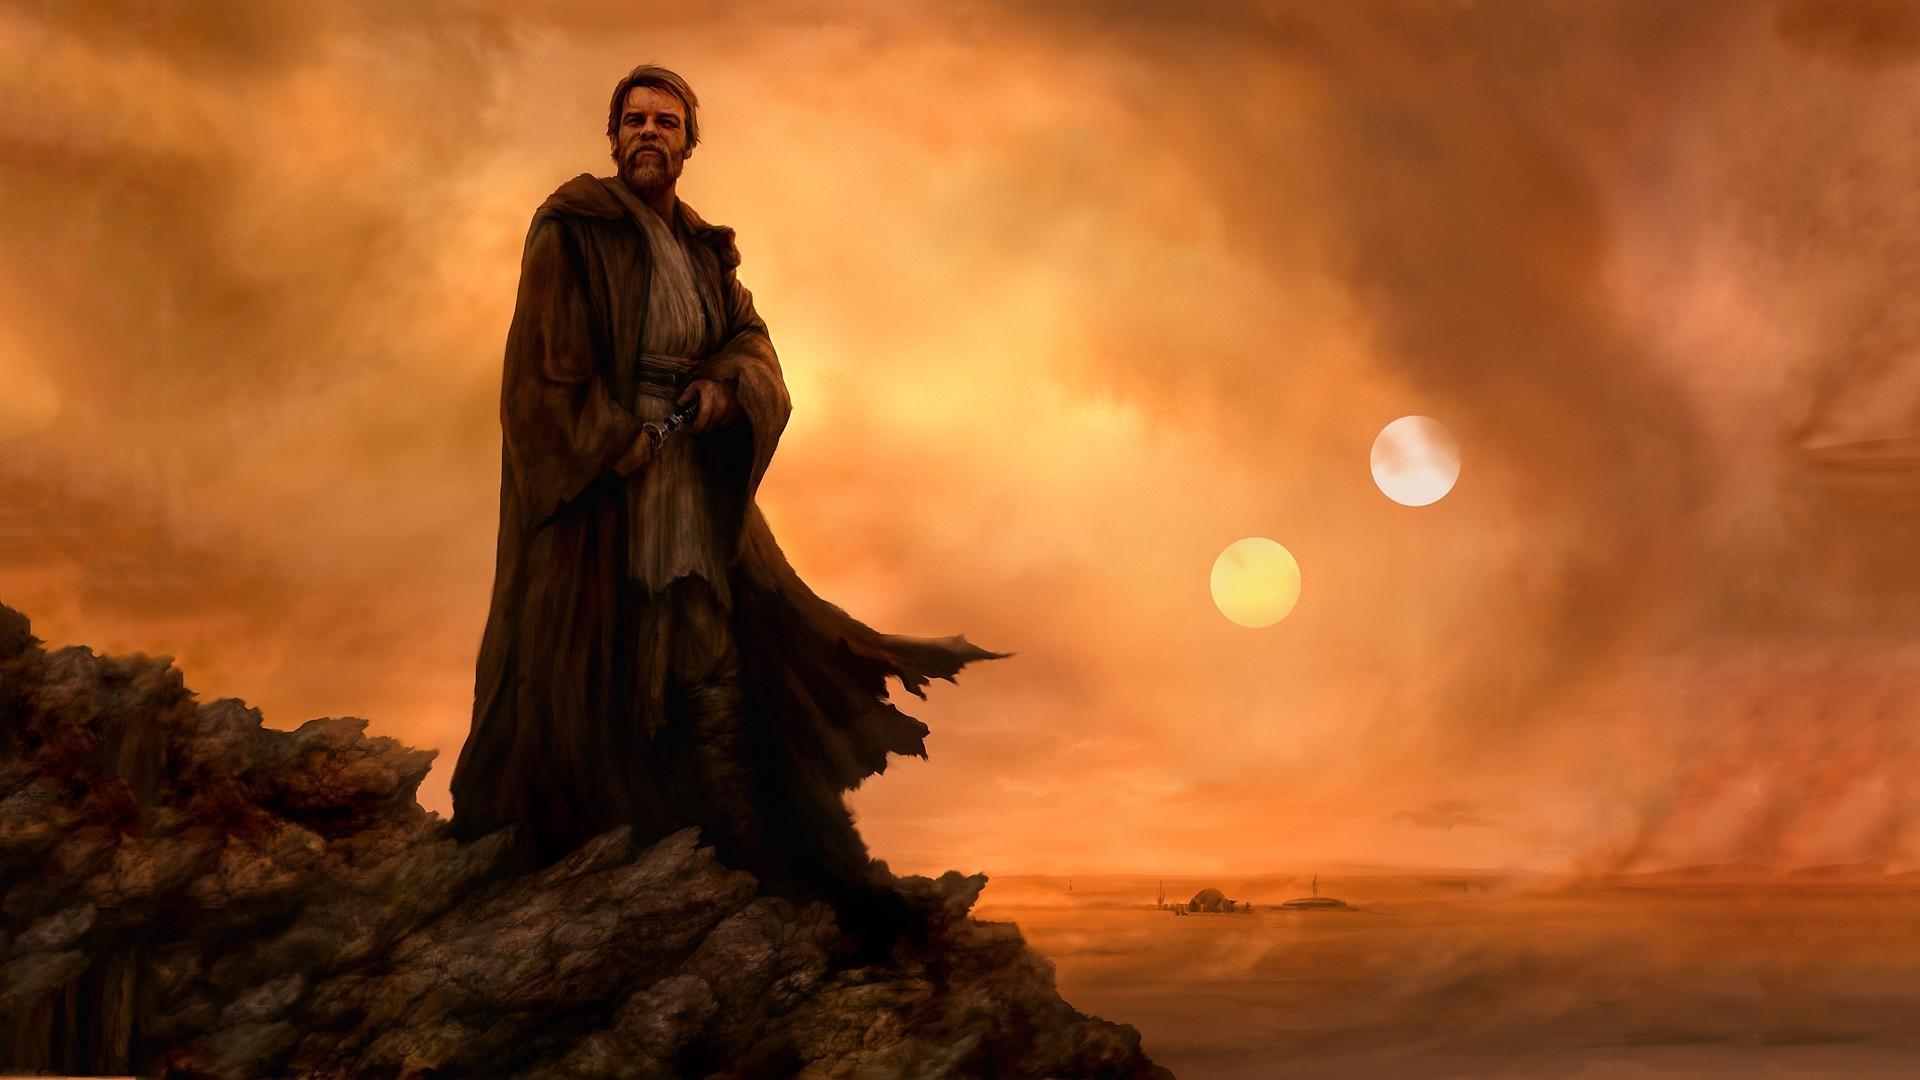 Star Wars Jedi Obi Wan Kenobi Tatooine Obi Wan Kenobi Art 1048149 Hd Wallpaper Backgrounds Download